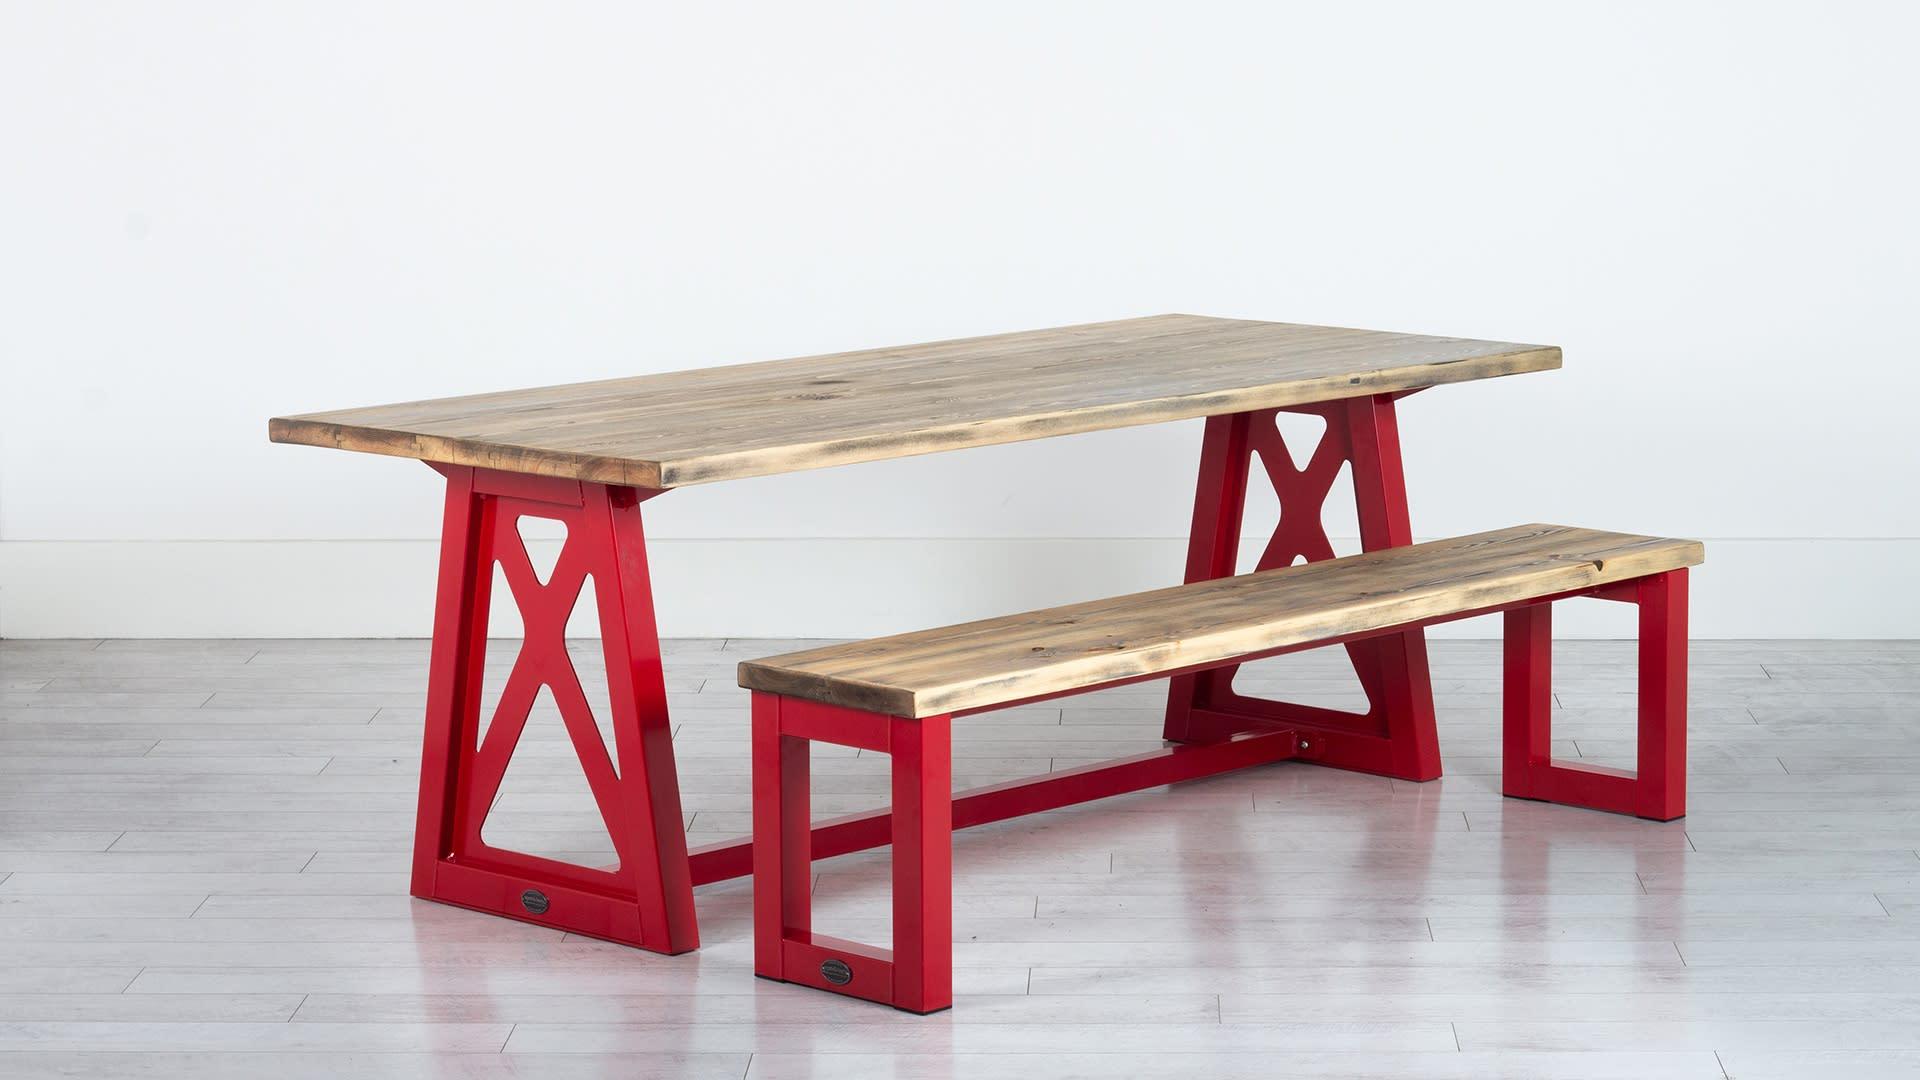 Steel Vintage Firehouse Table